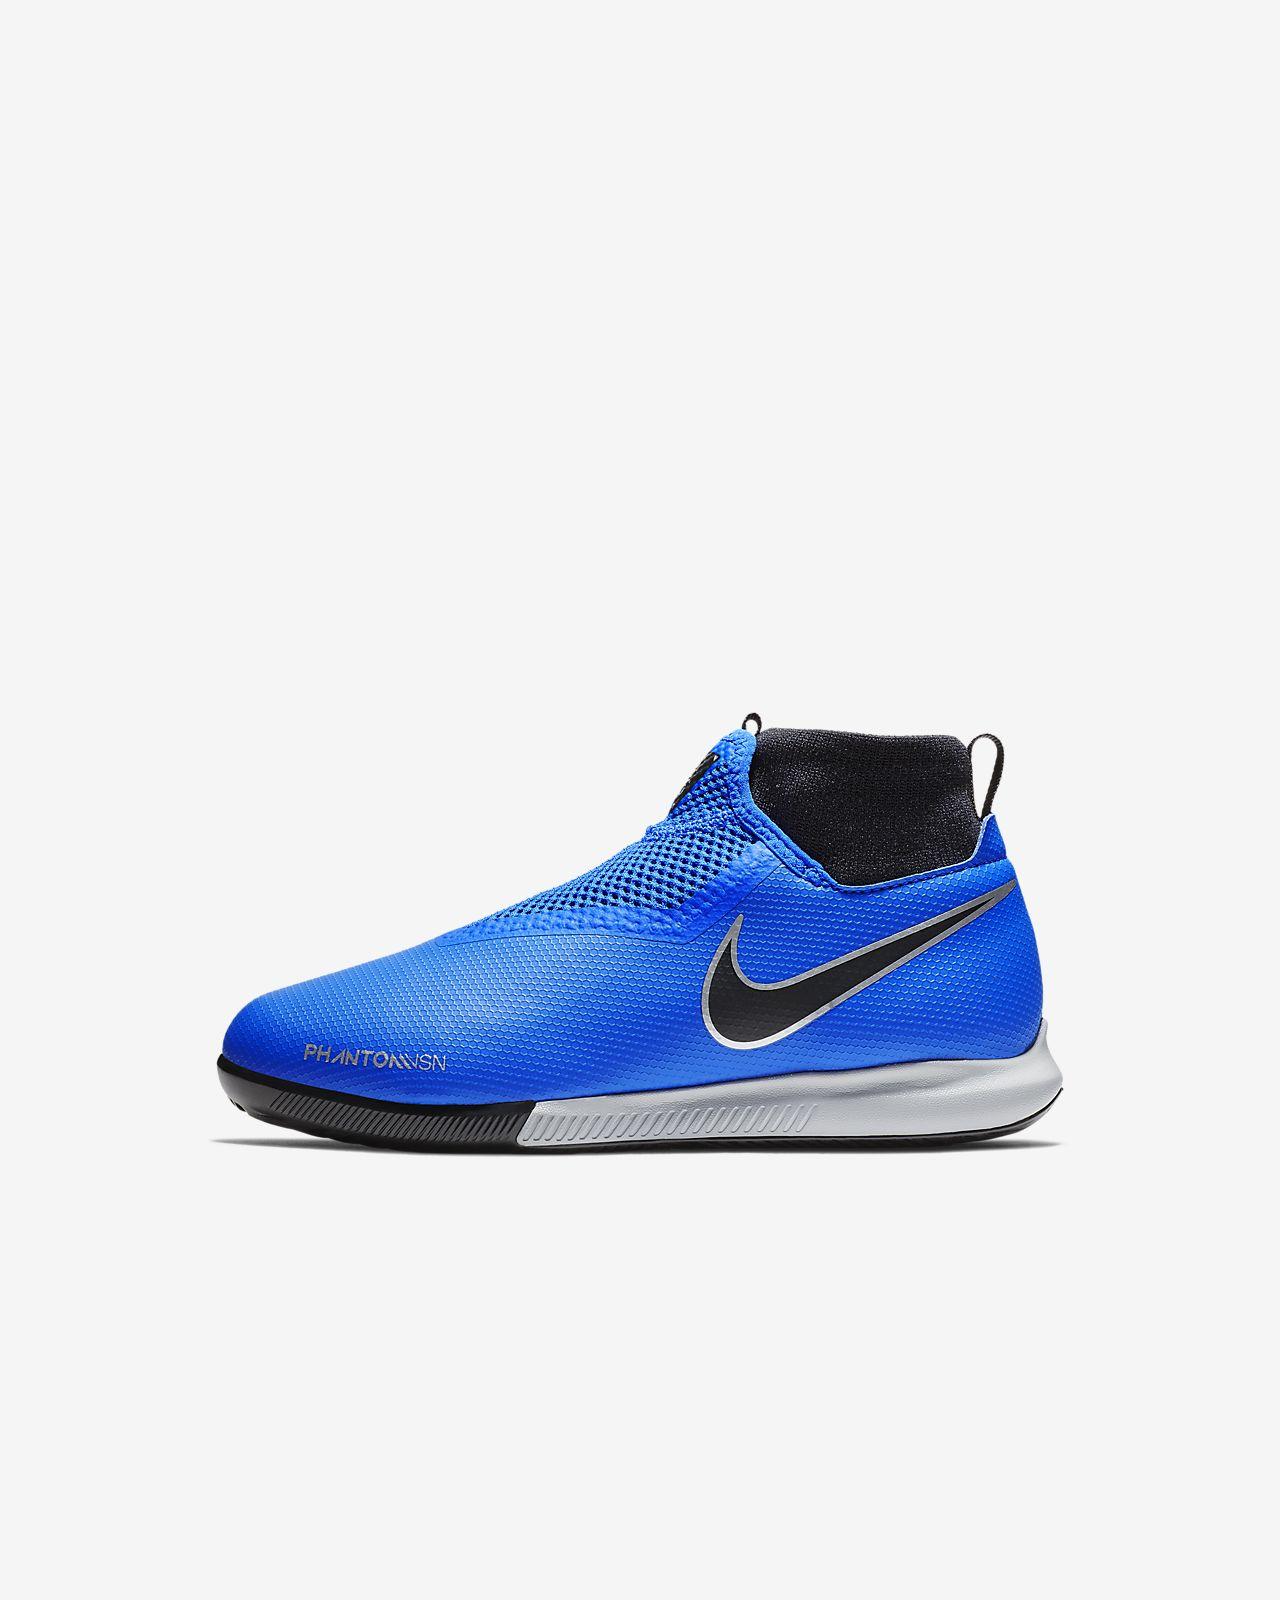 low priced 29093 25ed5 Nike Jr. PhantomVSN Academy Dynamic Fit IC Botas de fútbol sala - Niño a